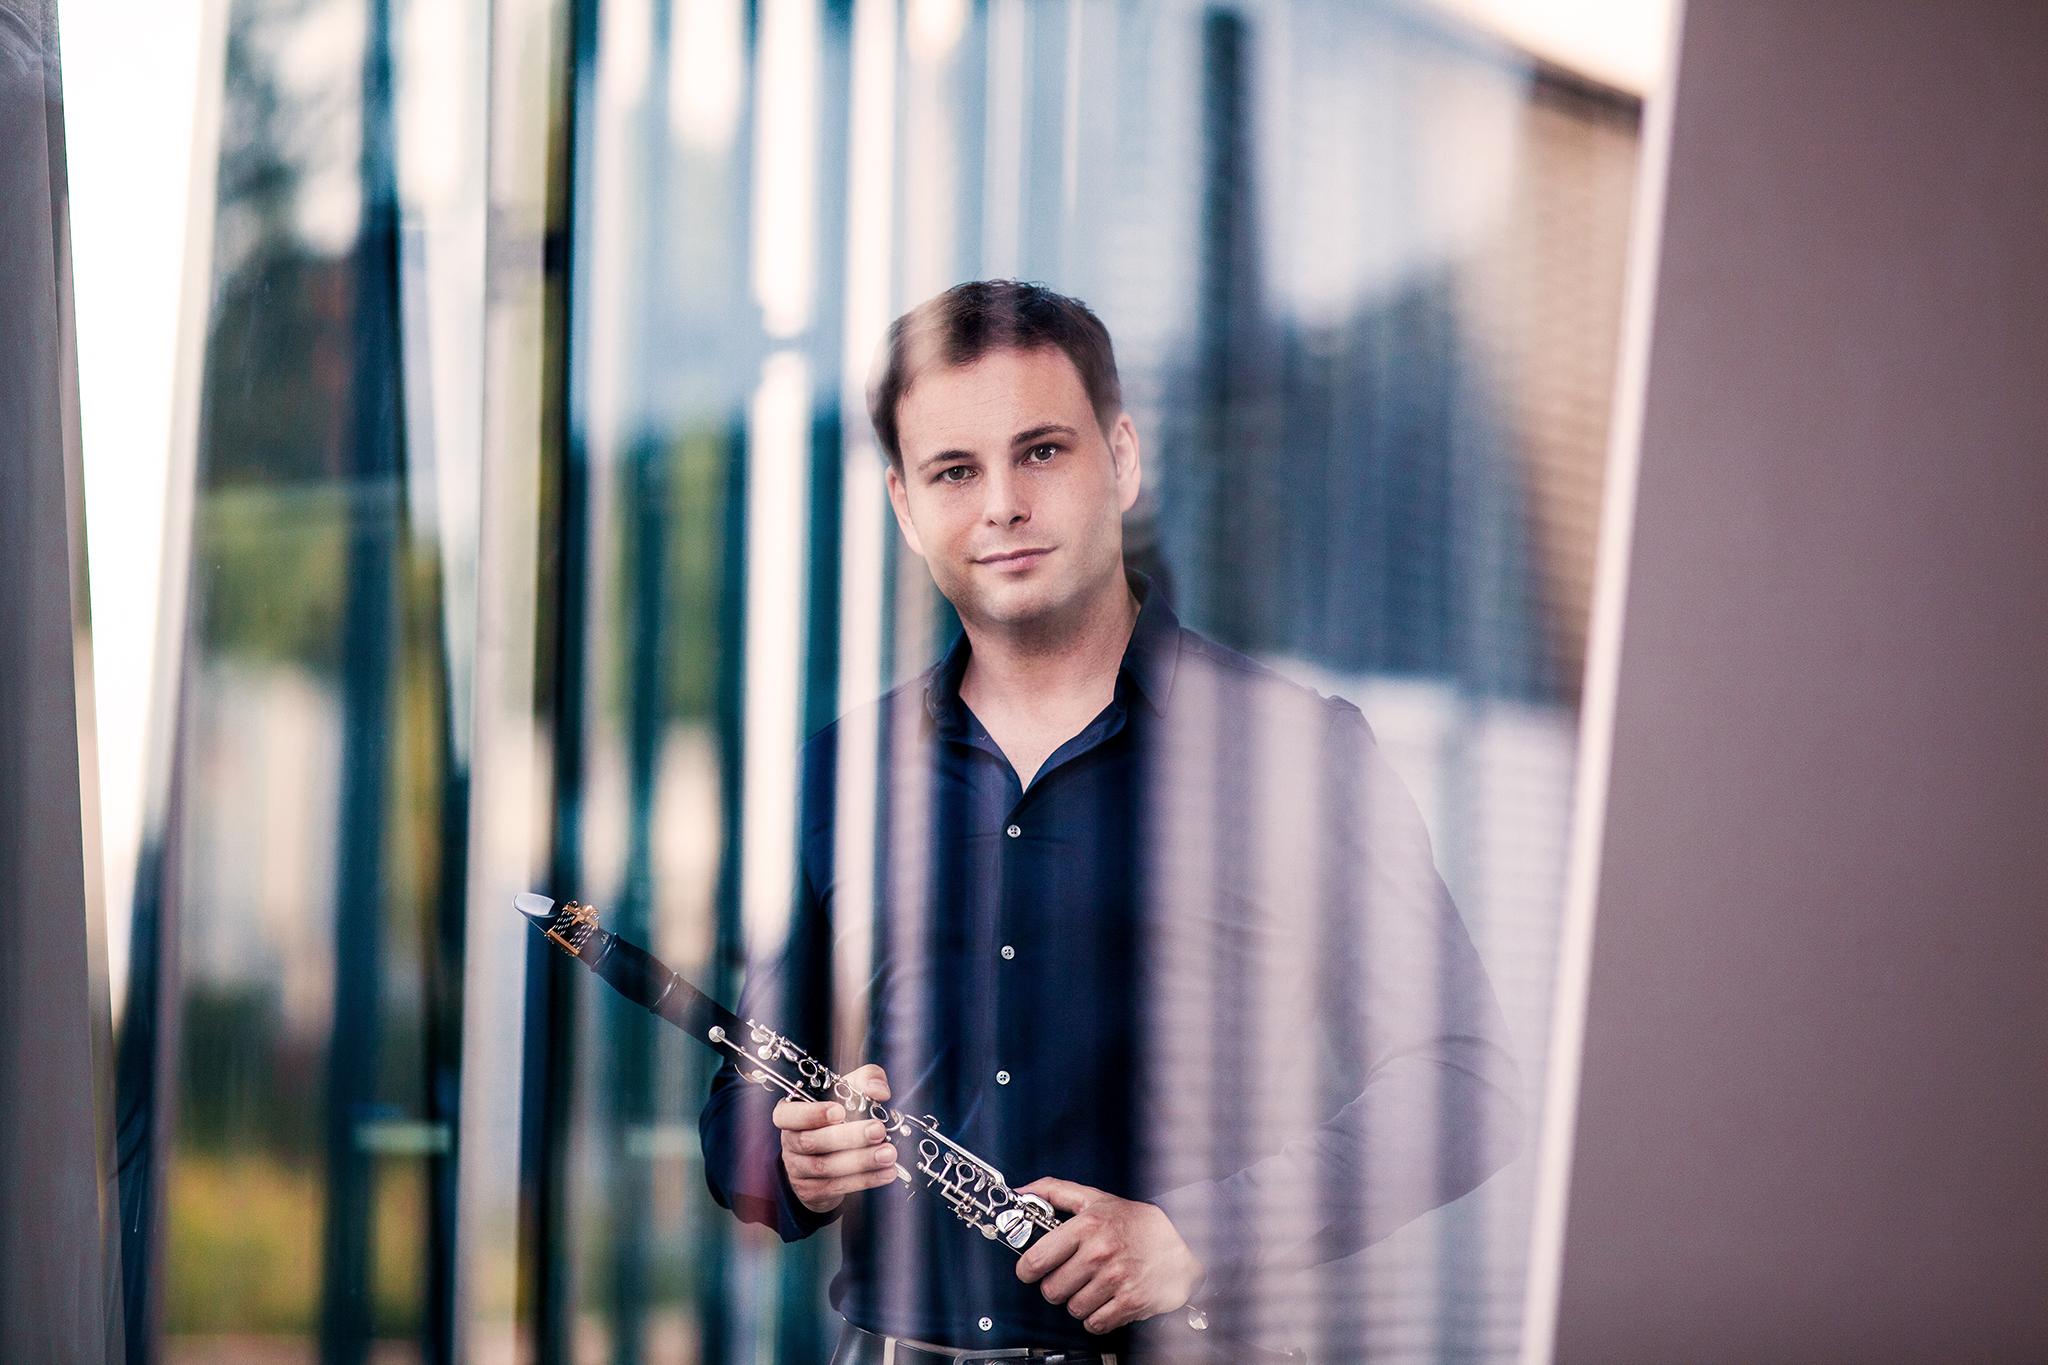 Nicolai Pfeffer clarinette